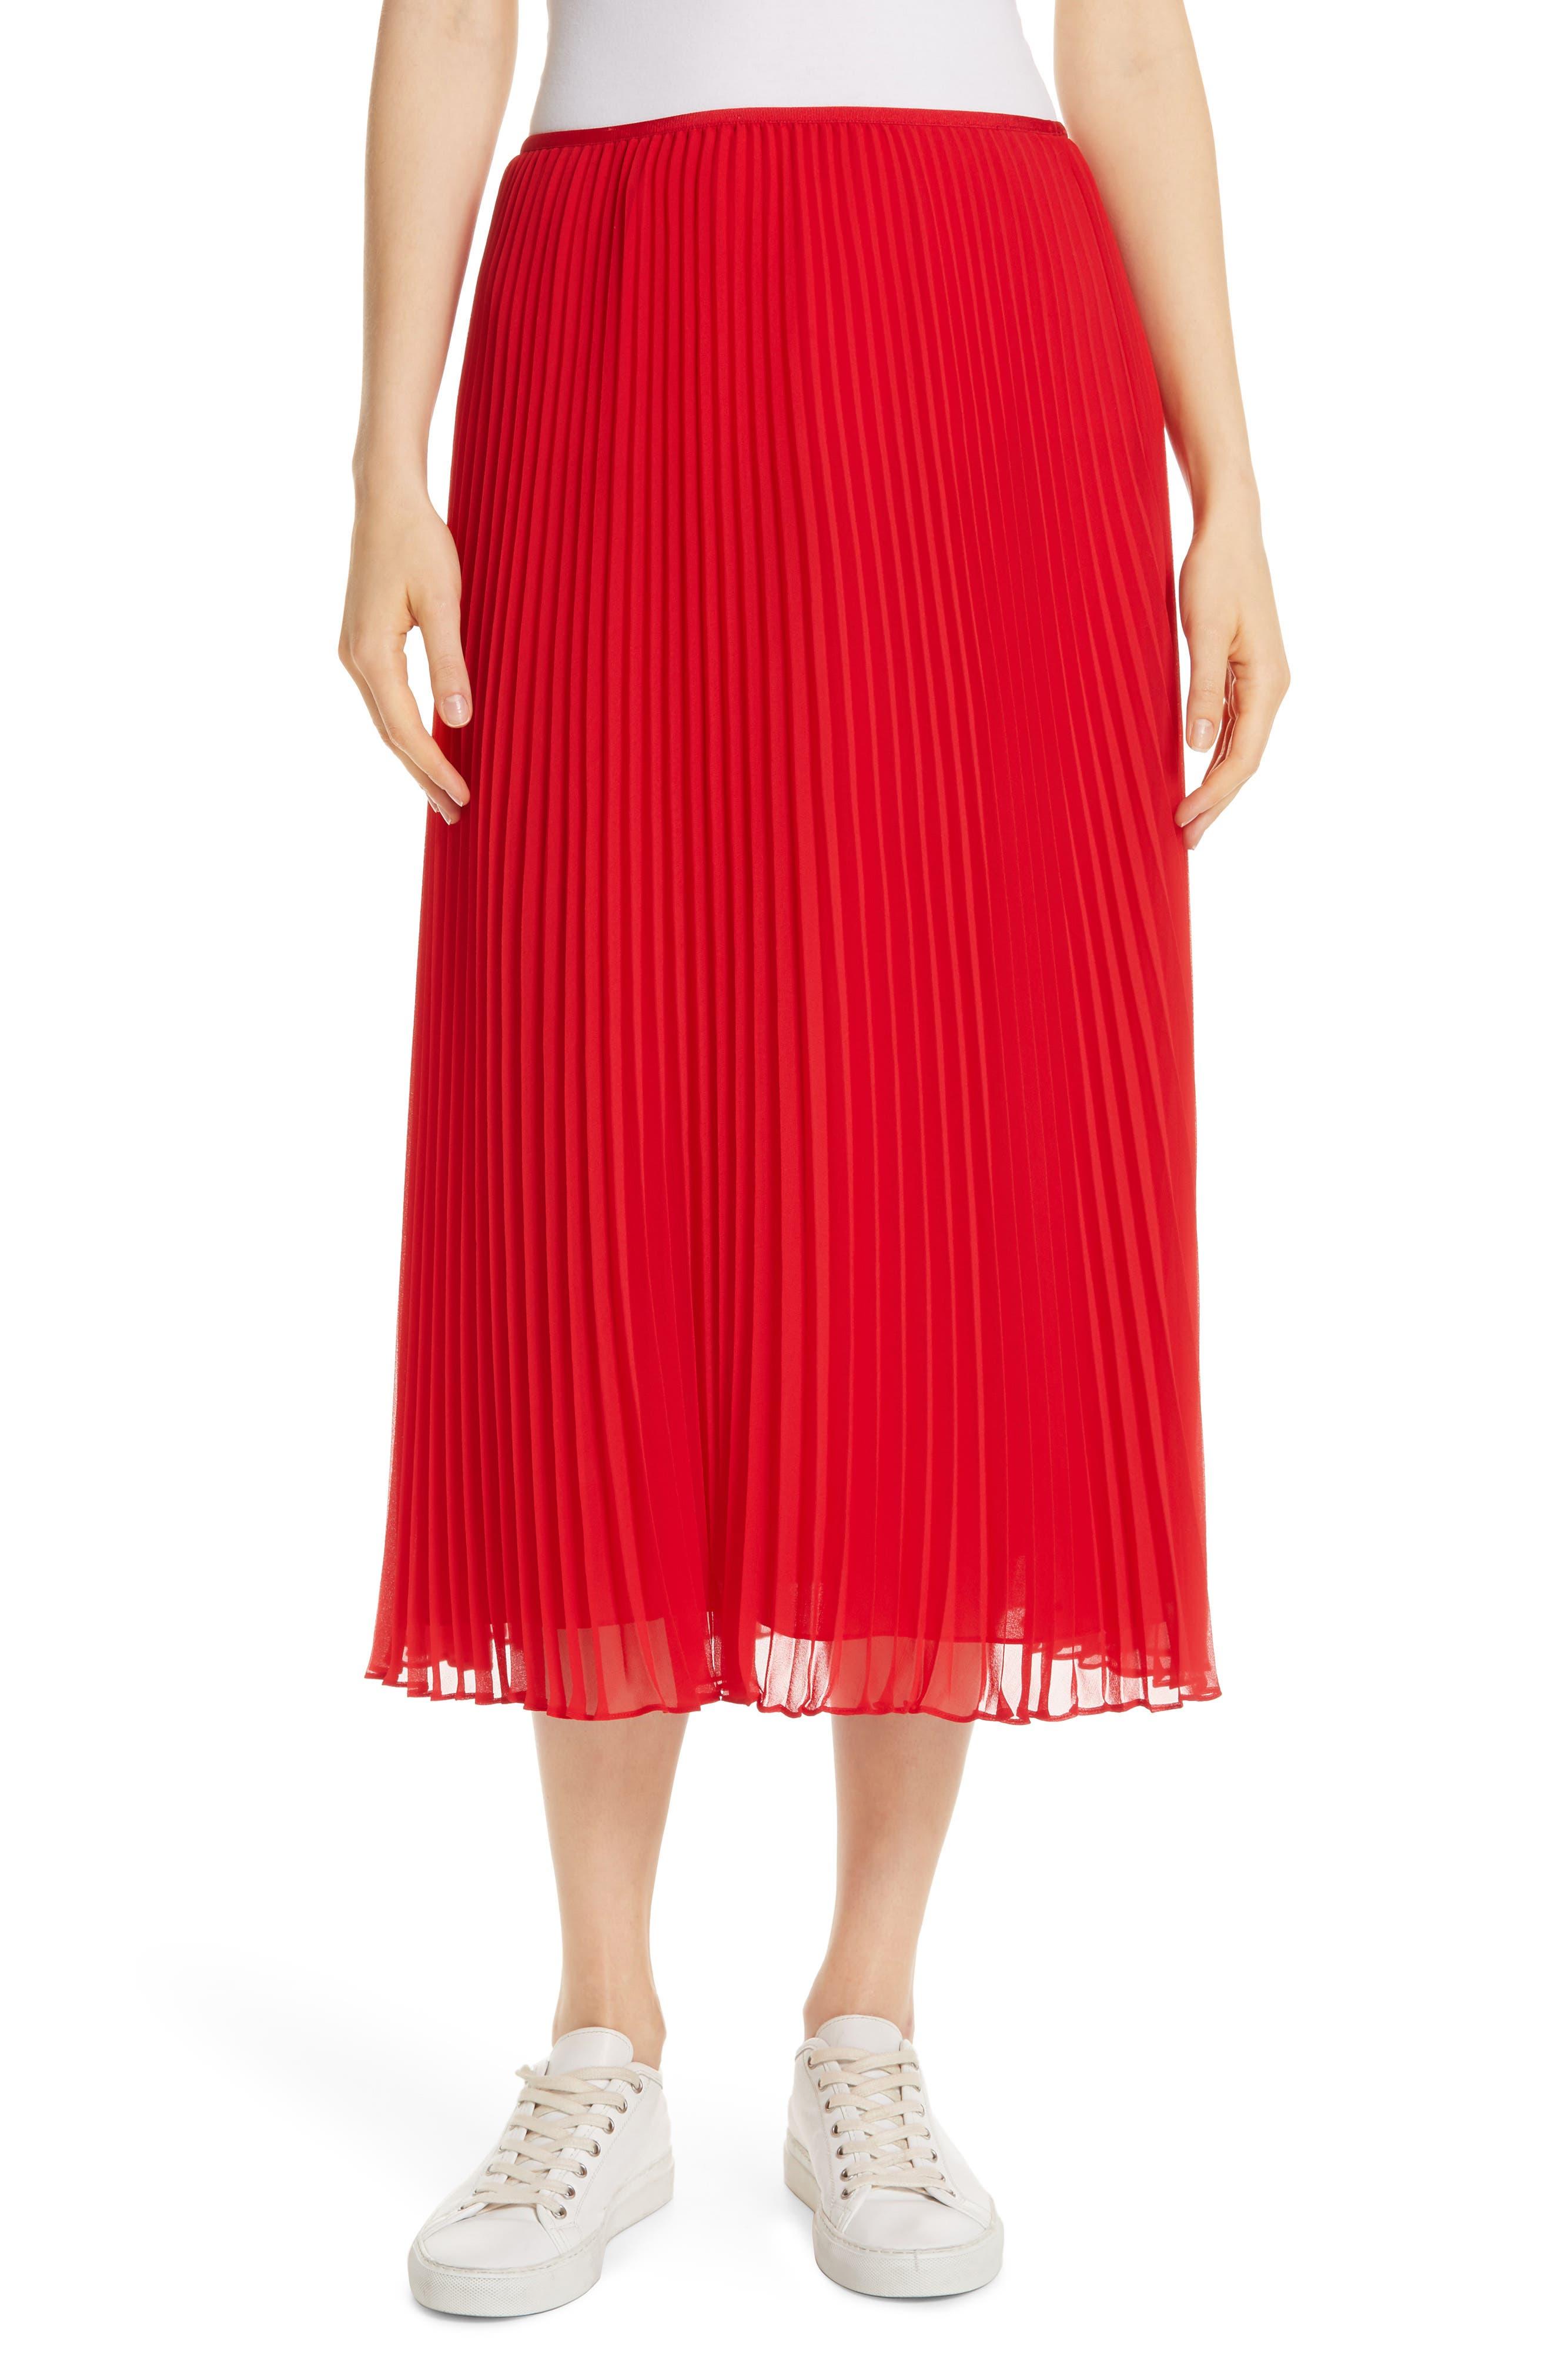 POLO RALPH LAUREN Pleat Midi Skirt, Main, color, PANDORA RED